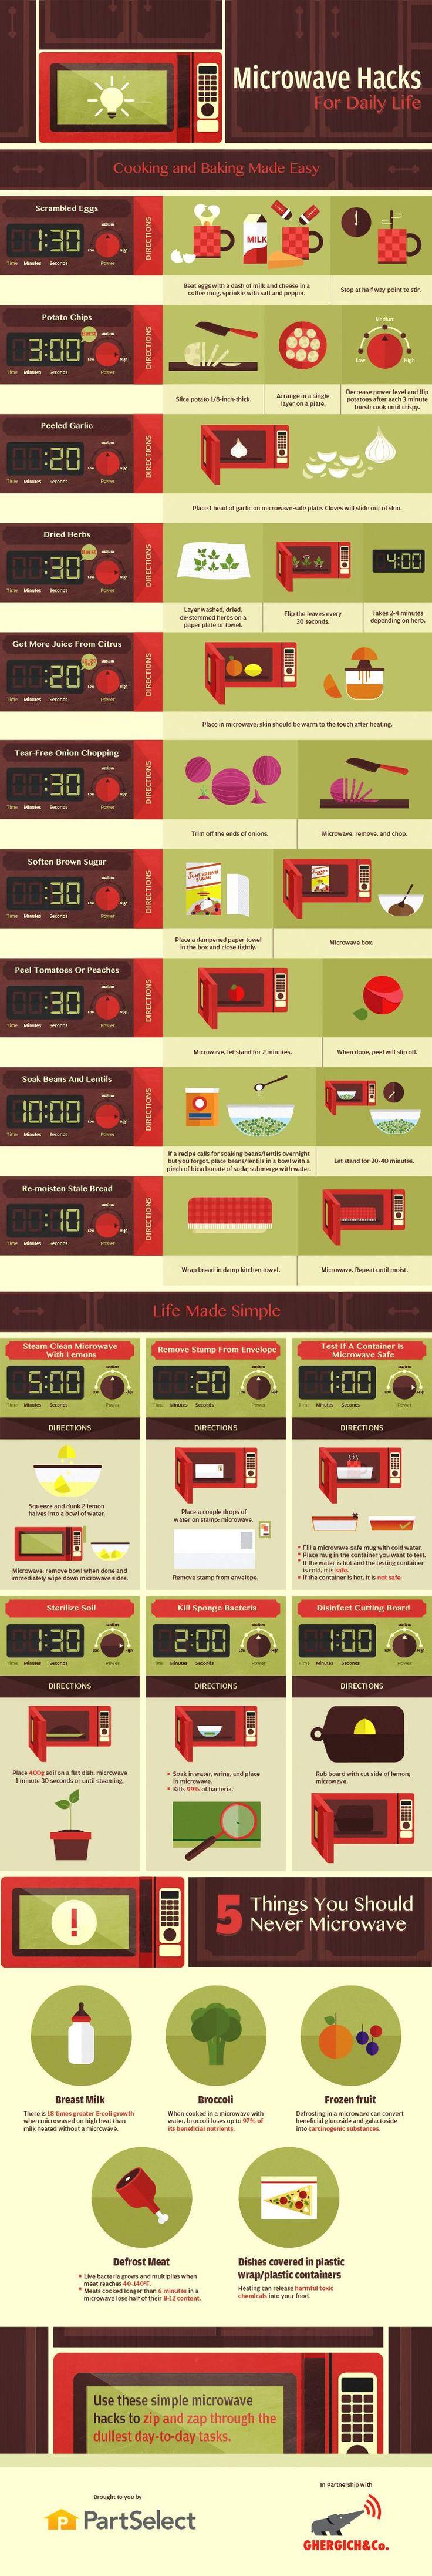 Microwave Hacks for Daily Life - Imgur